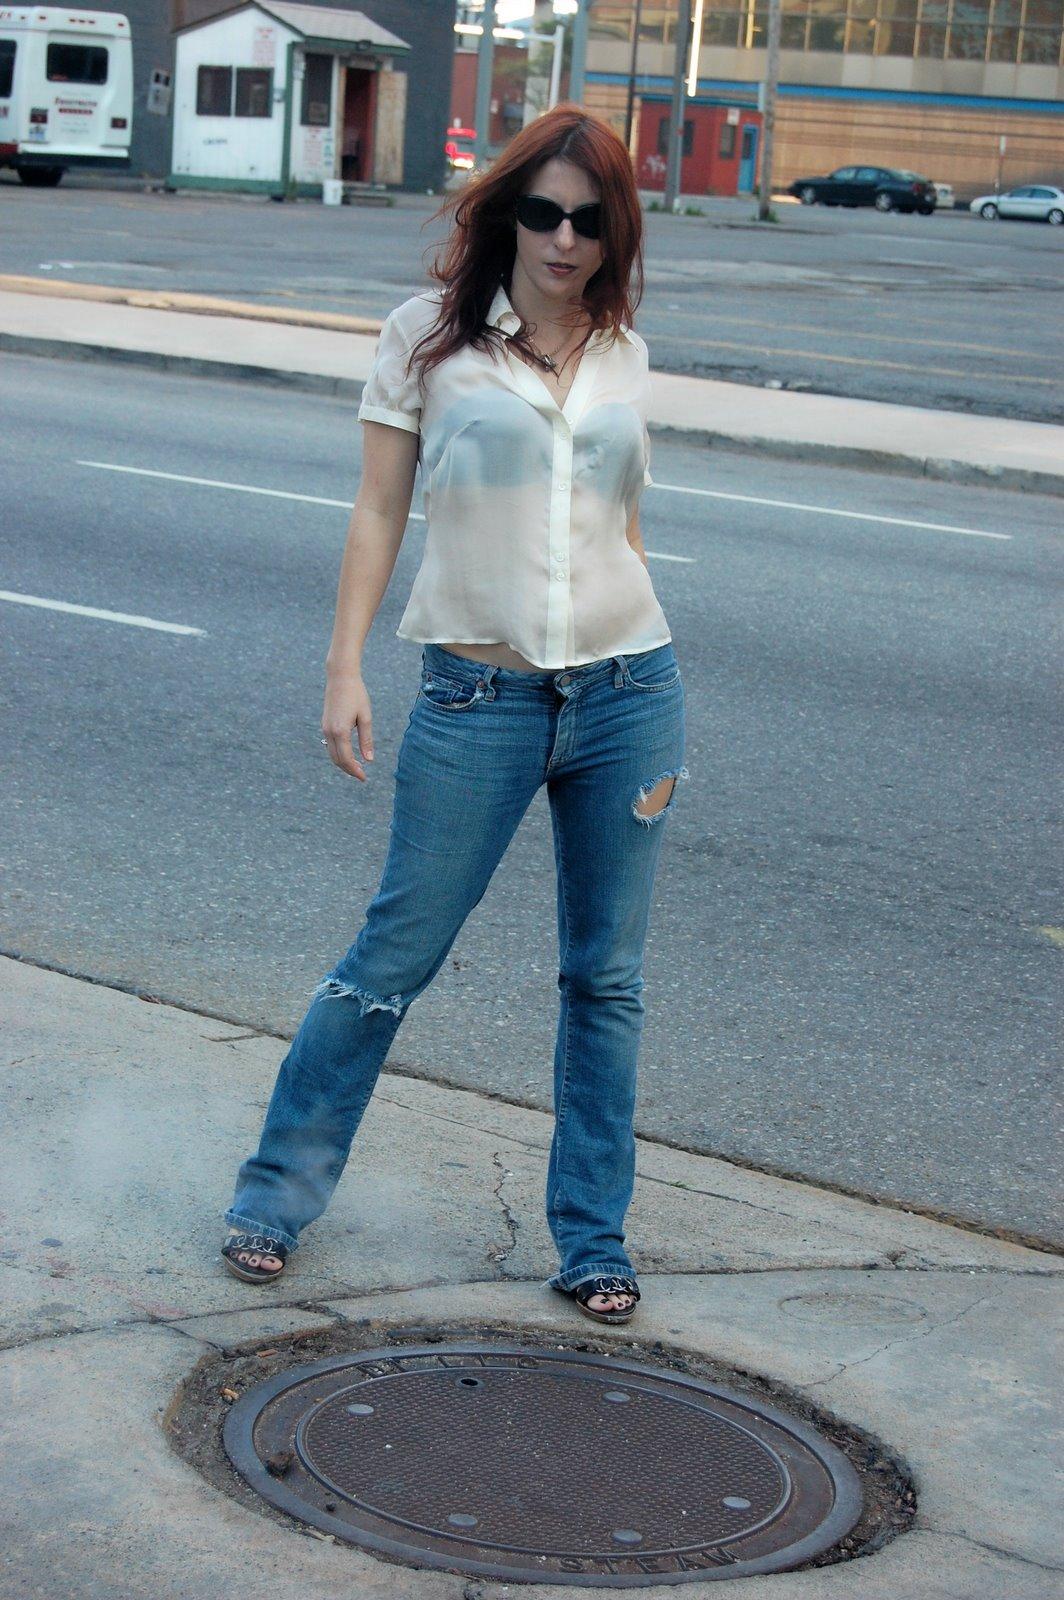 [michelle+Brooks+Streets+of+Detroit.jpg]